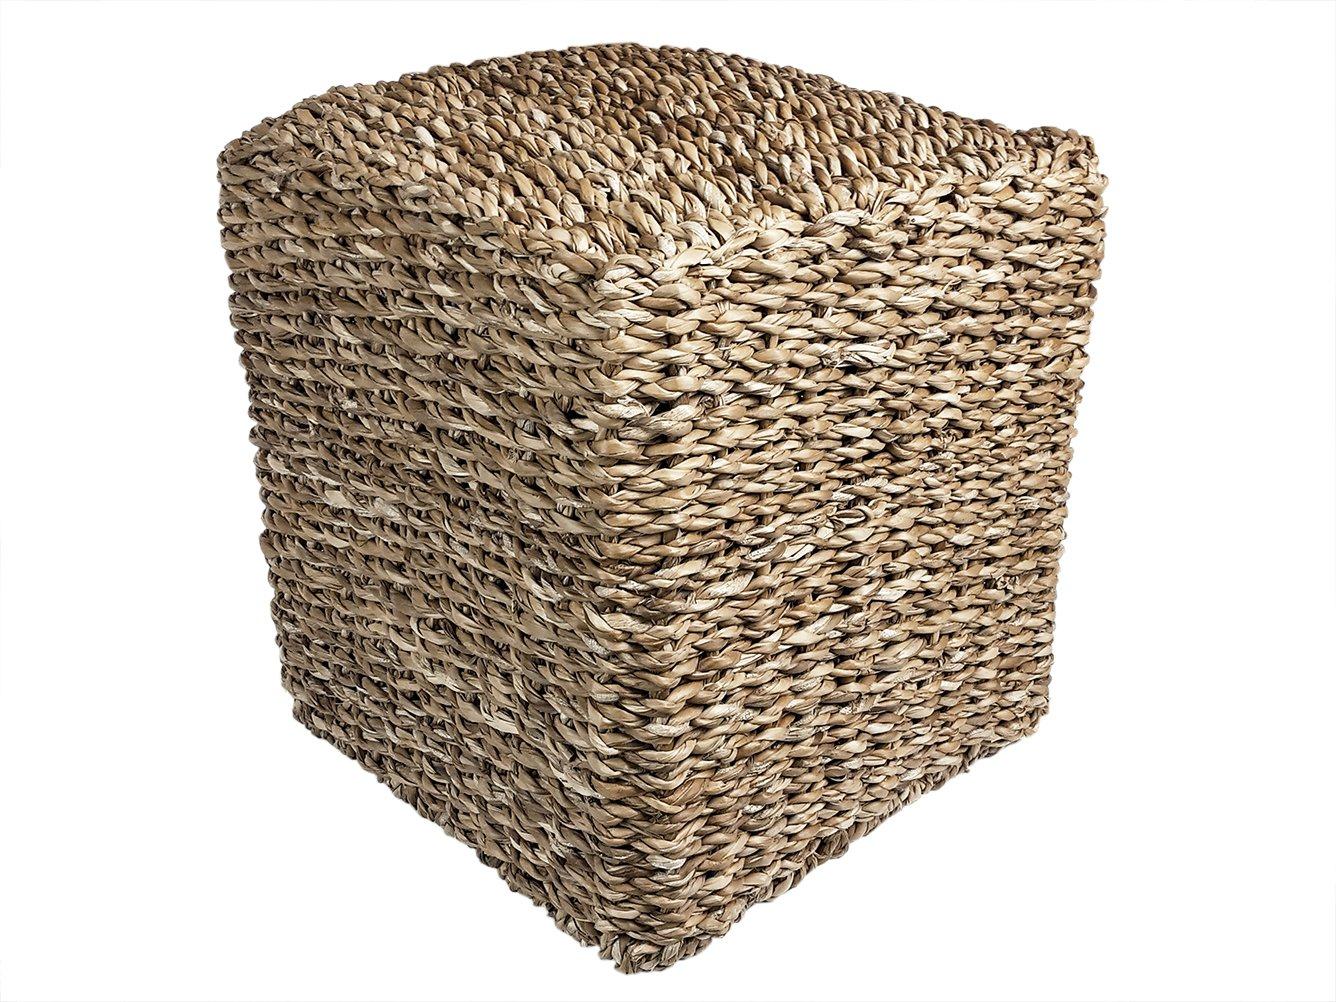 Fair Fair Fair Trade Korbwaren Taburete de Hogla de Fibra ndash; Comercio Justo ndash; Lounge Taburete ndash; Diferentes tamantilde;os, 45 cm a28810